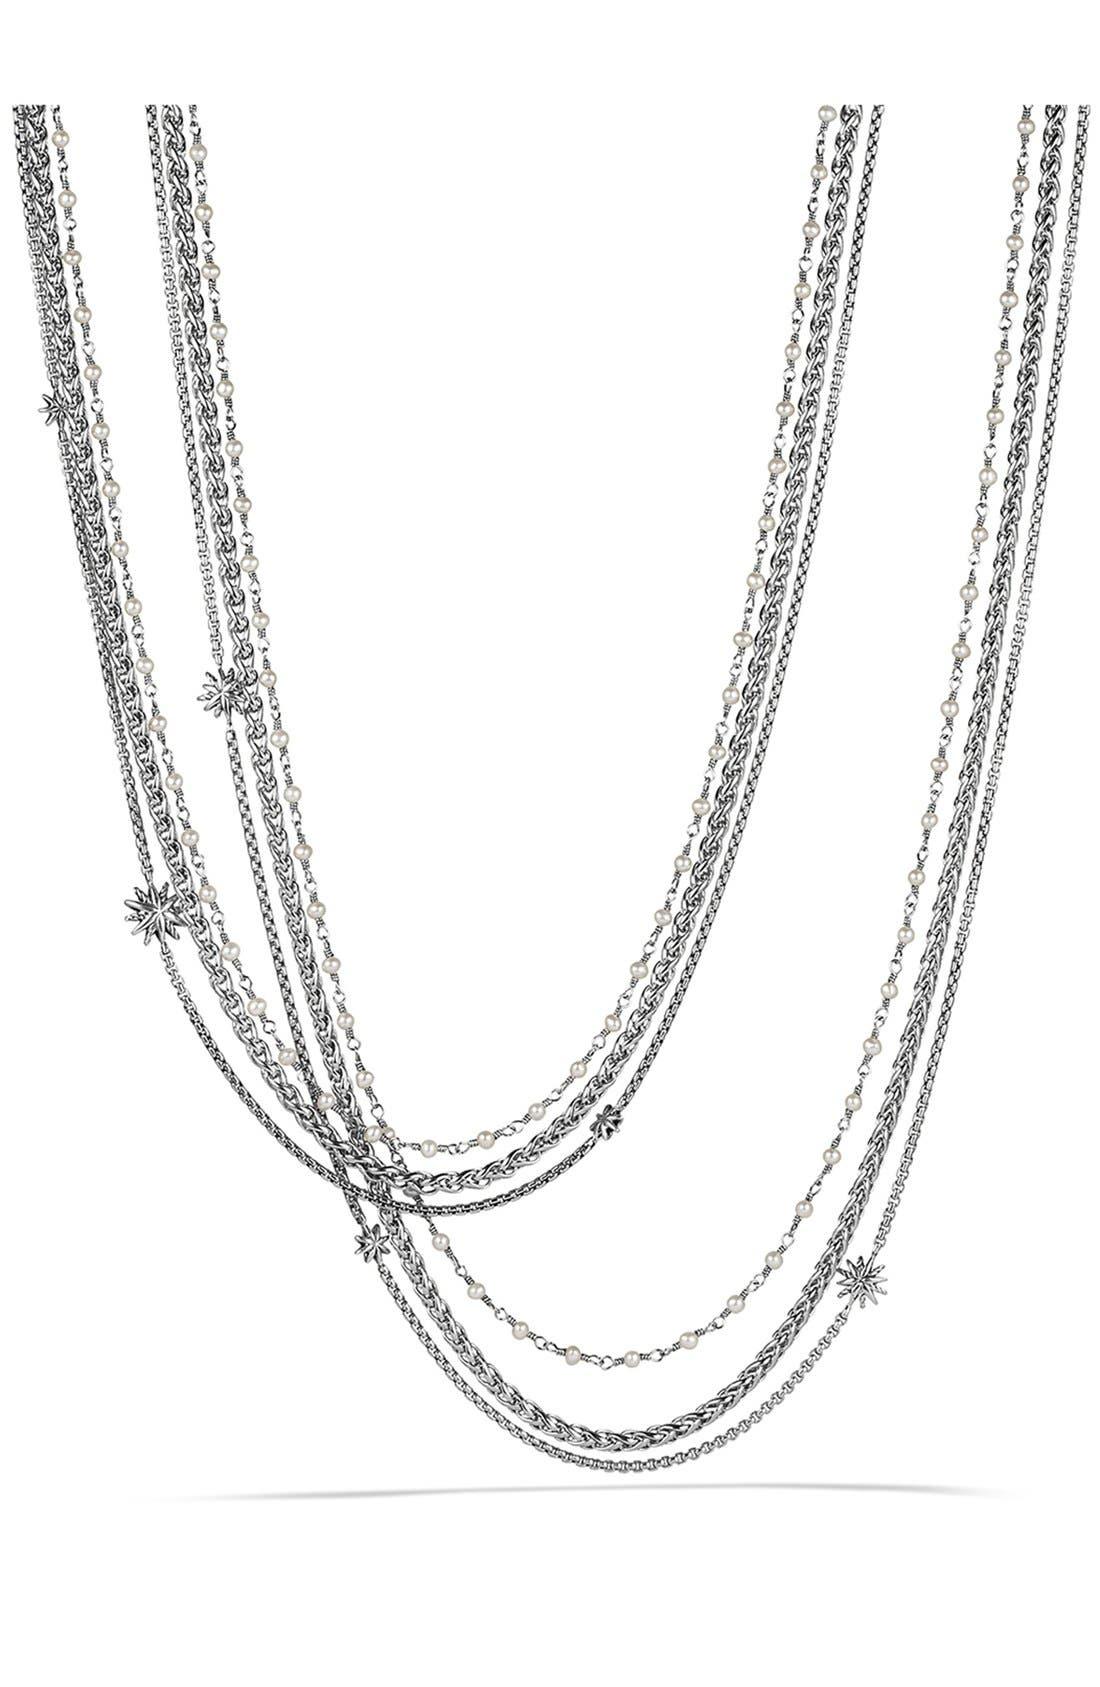 David Yurman 'Starburst' Chain Necklace with Pearls